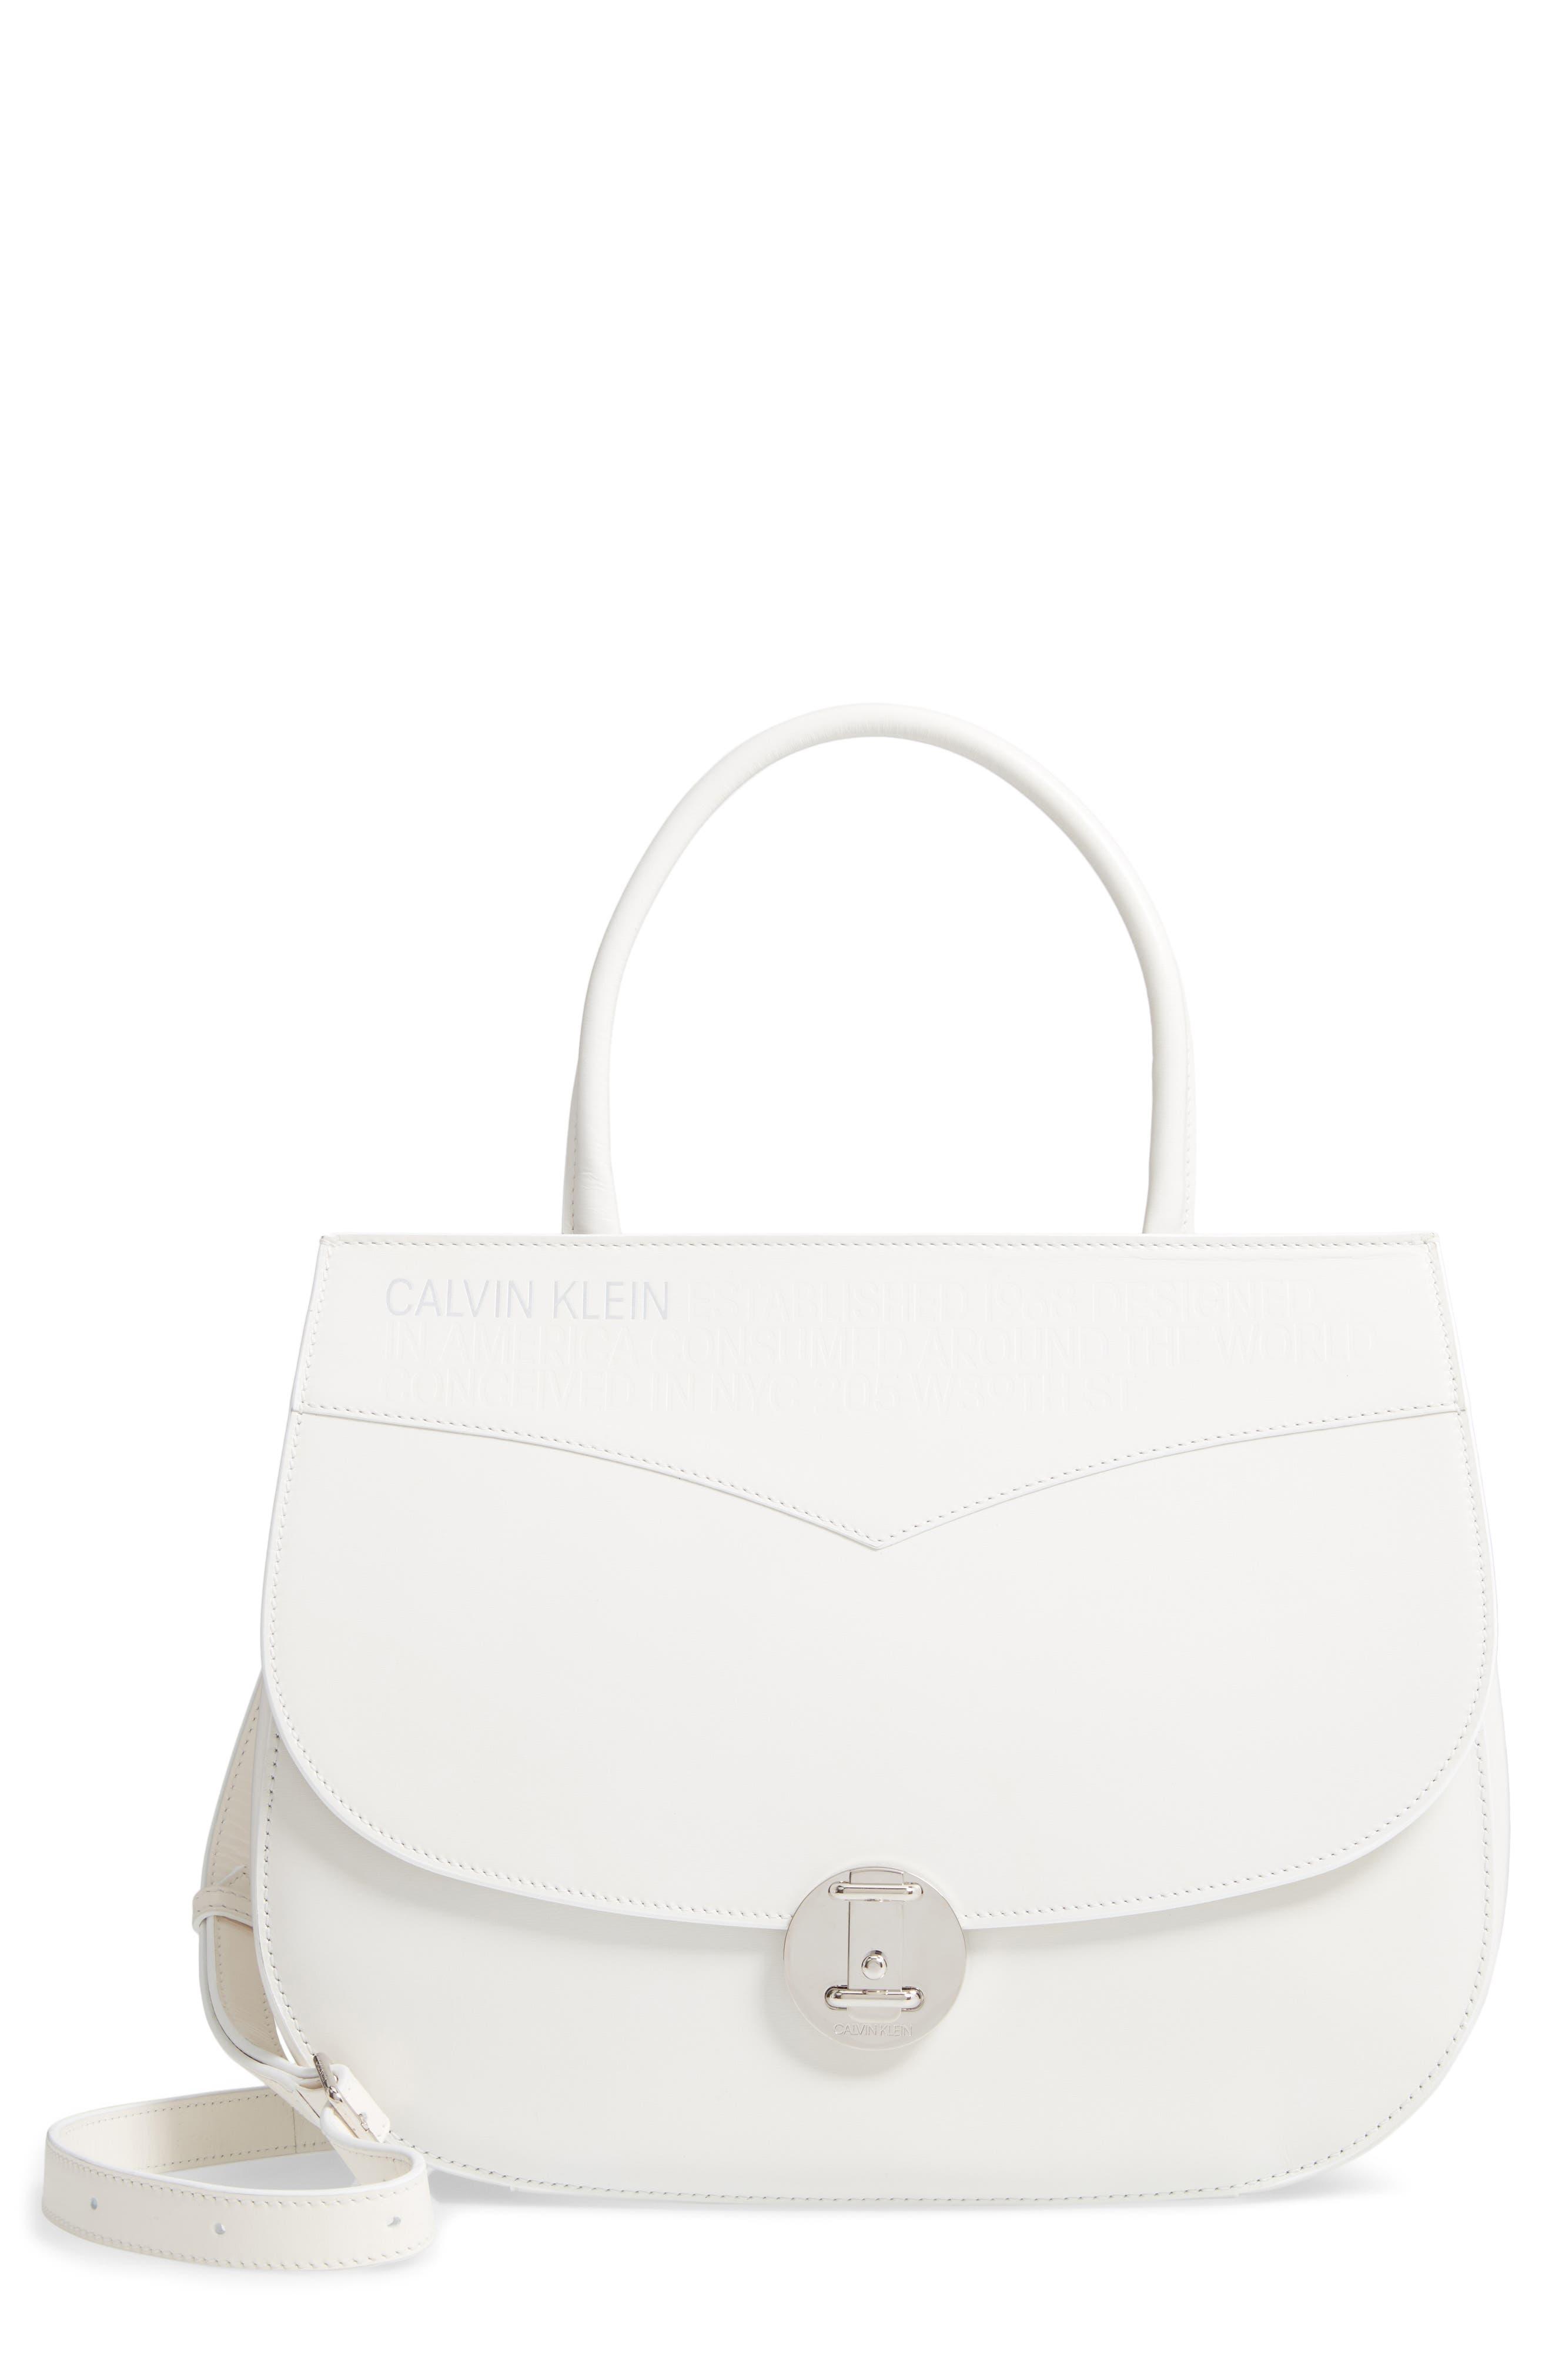 Top Handle Round Lock Shoulder Bag,                             Main thumbnail 1, color,                             101